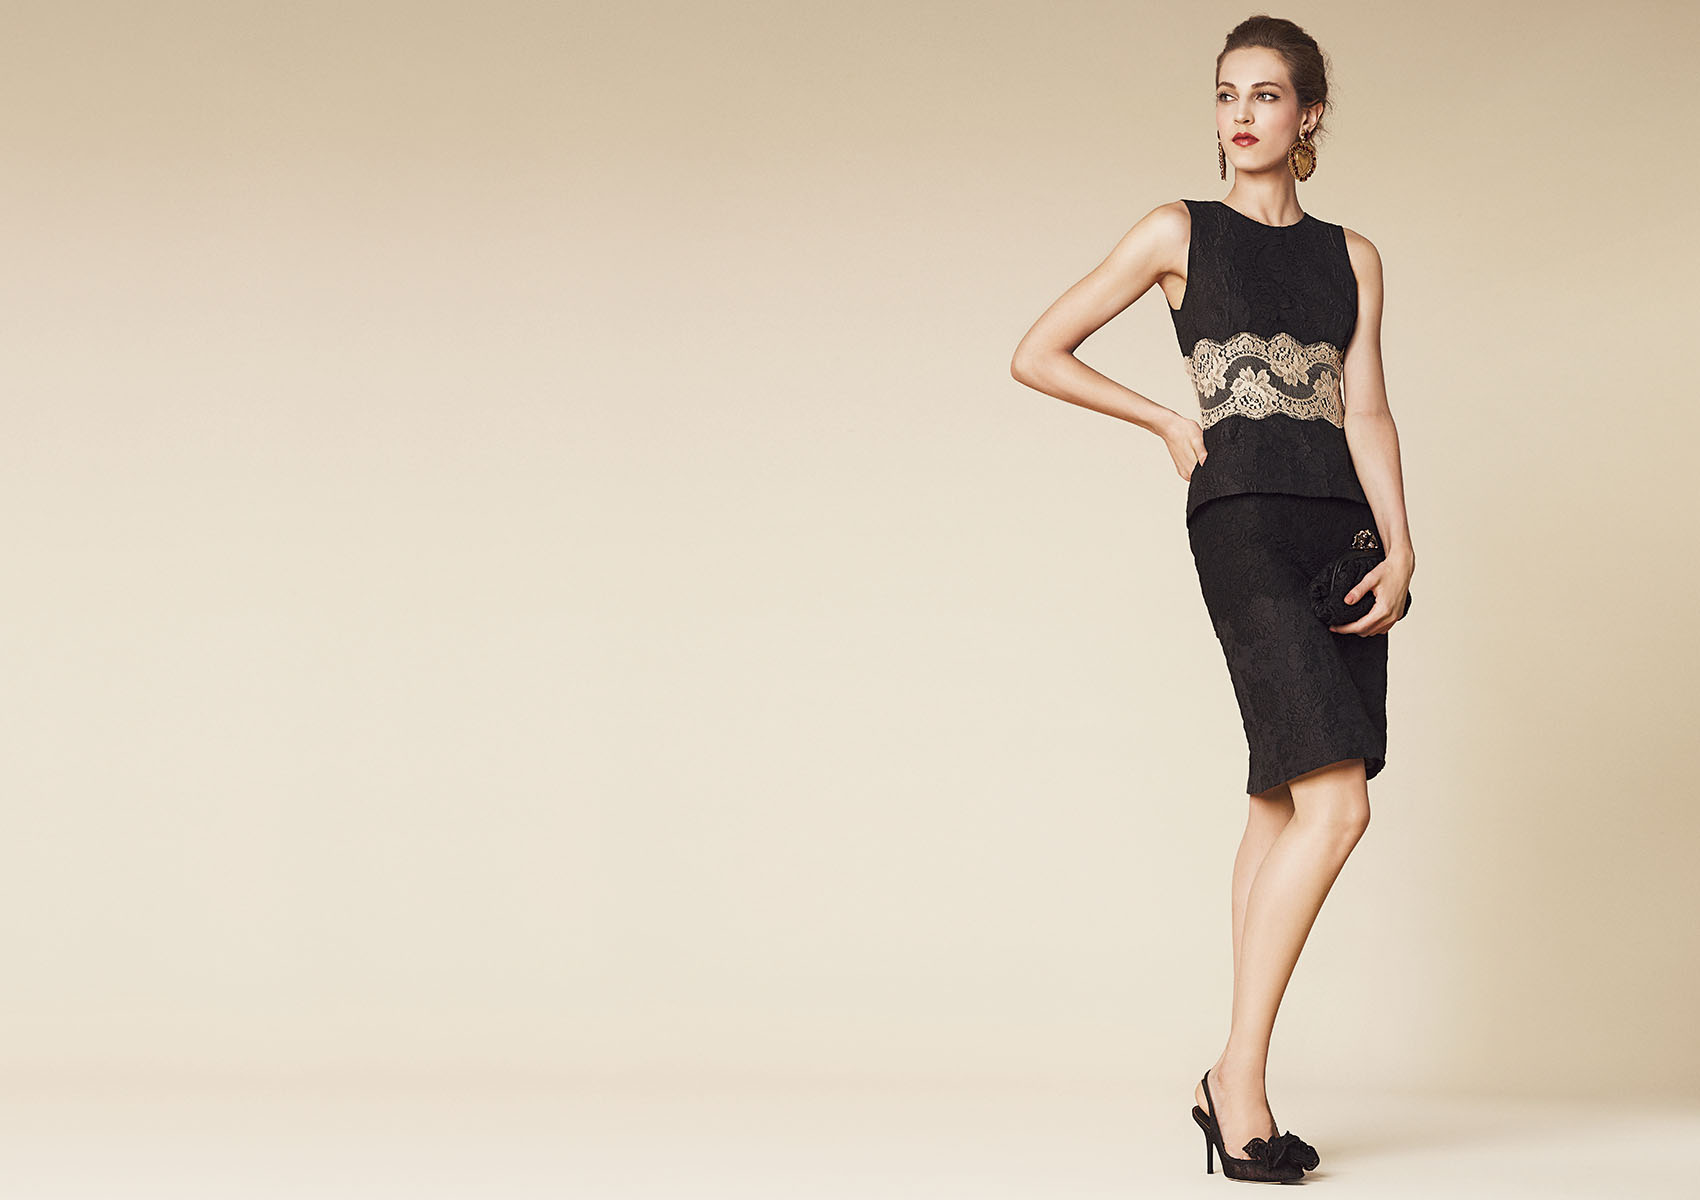 dolce-gabbana-ss-2013-collection-women-005.jpg